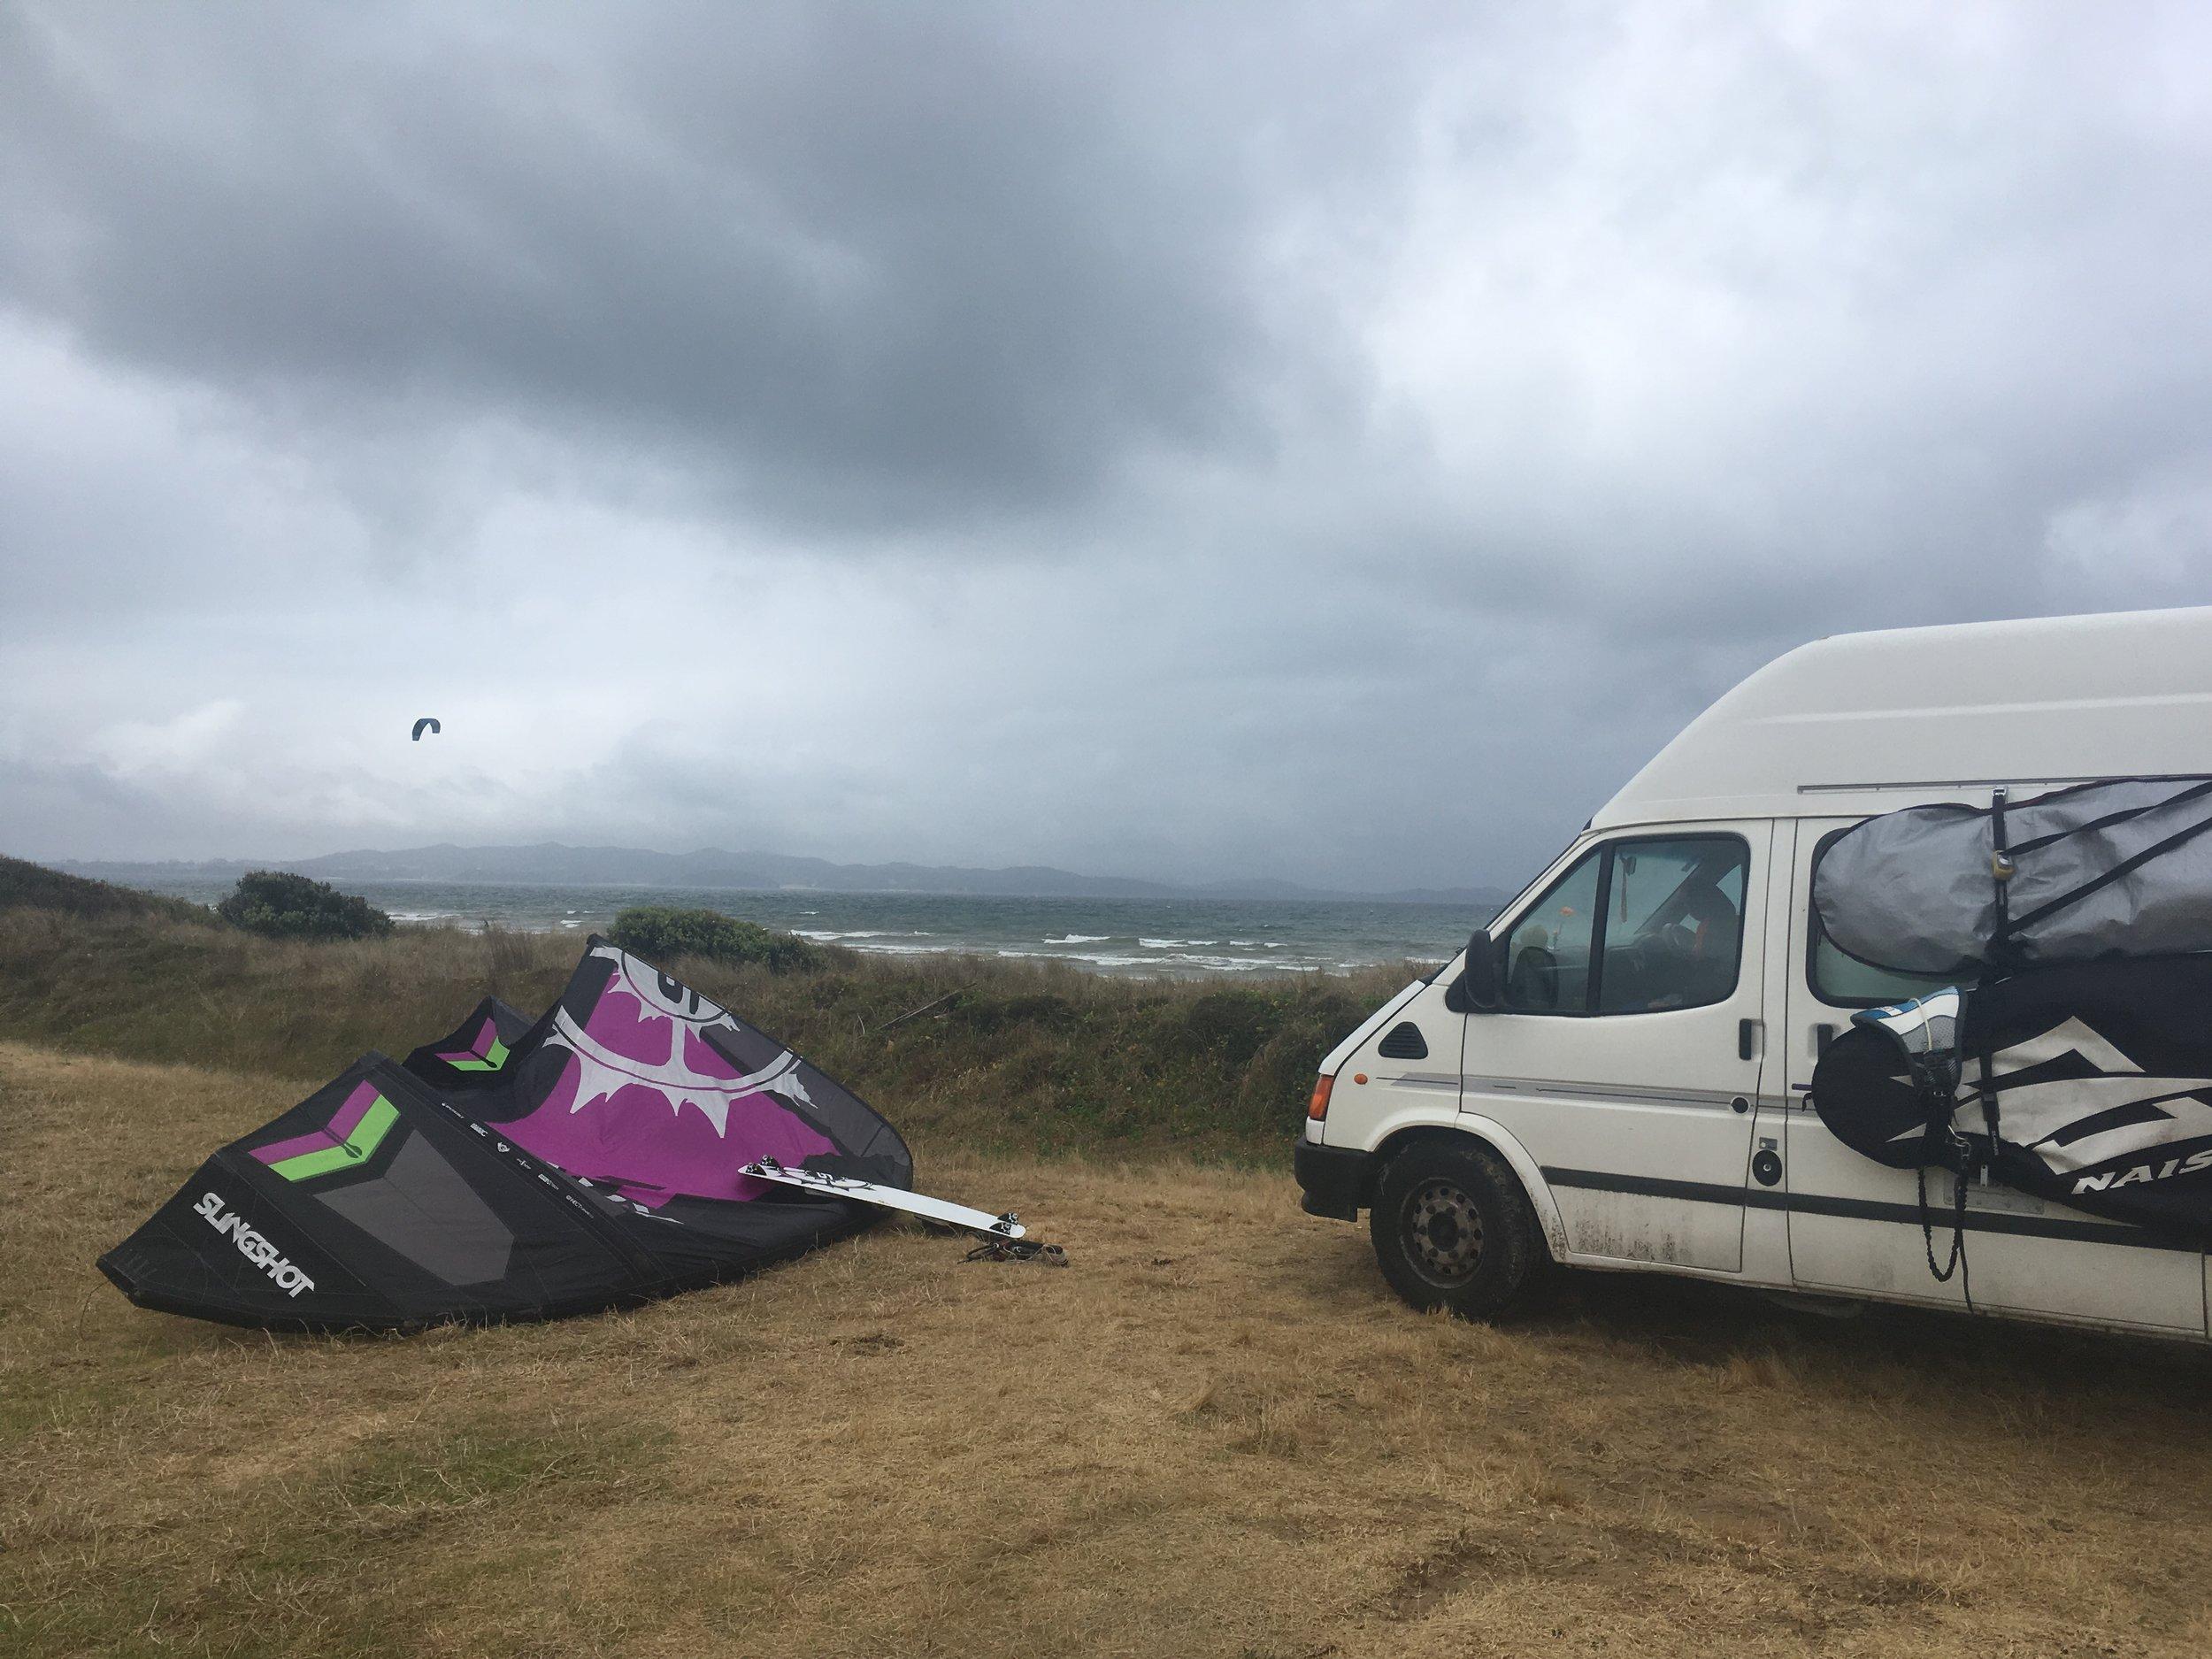 Kitesurfing at Tokerau Beach